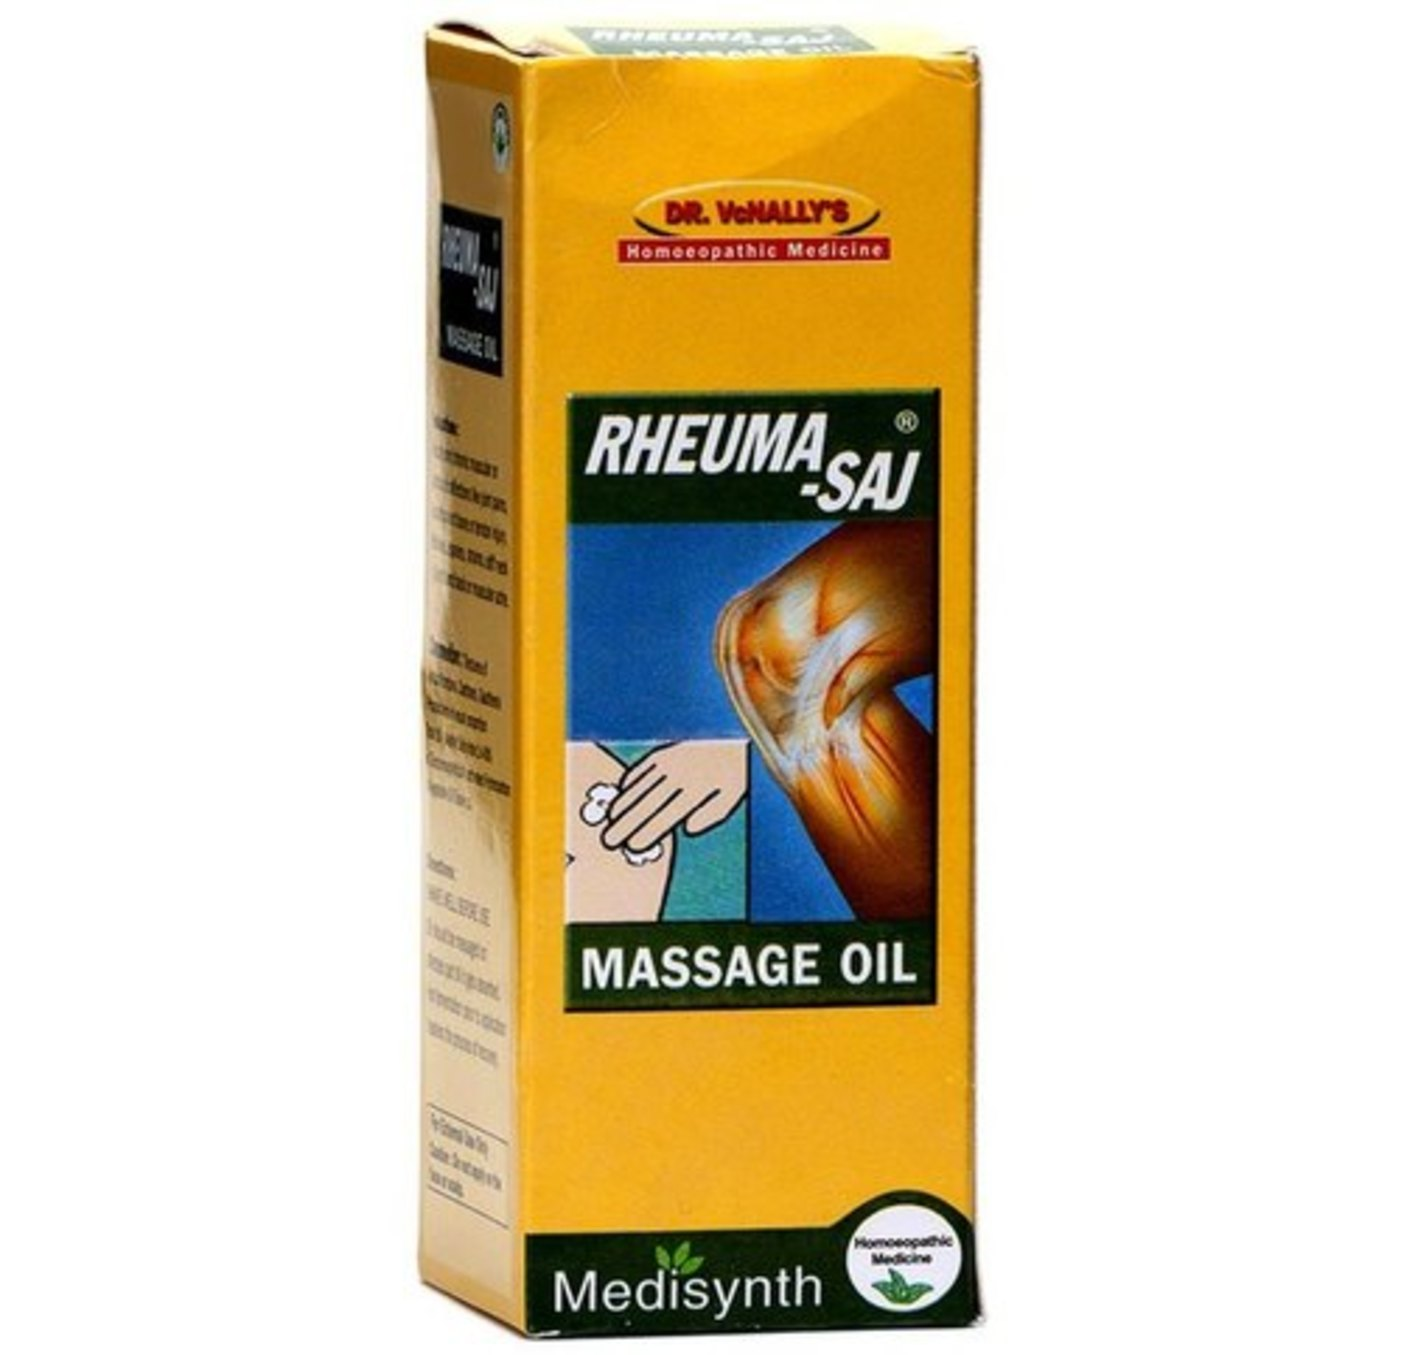 Medisynth Rheuma-Saj Massage Oil Homeopathic Medicine style=